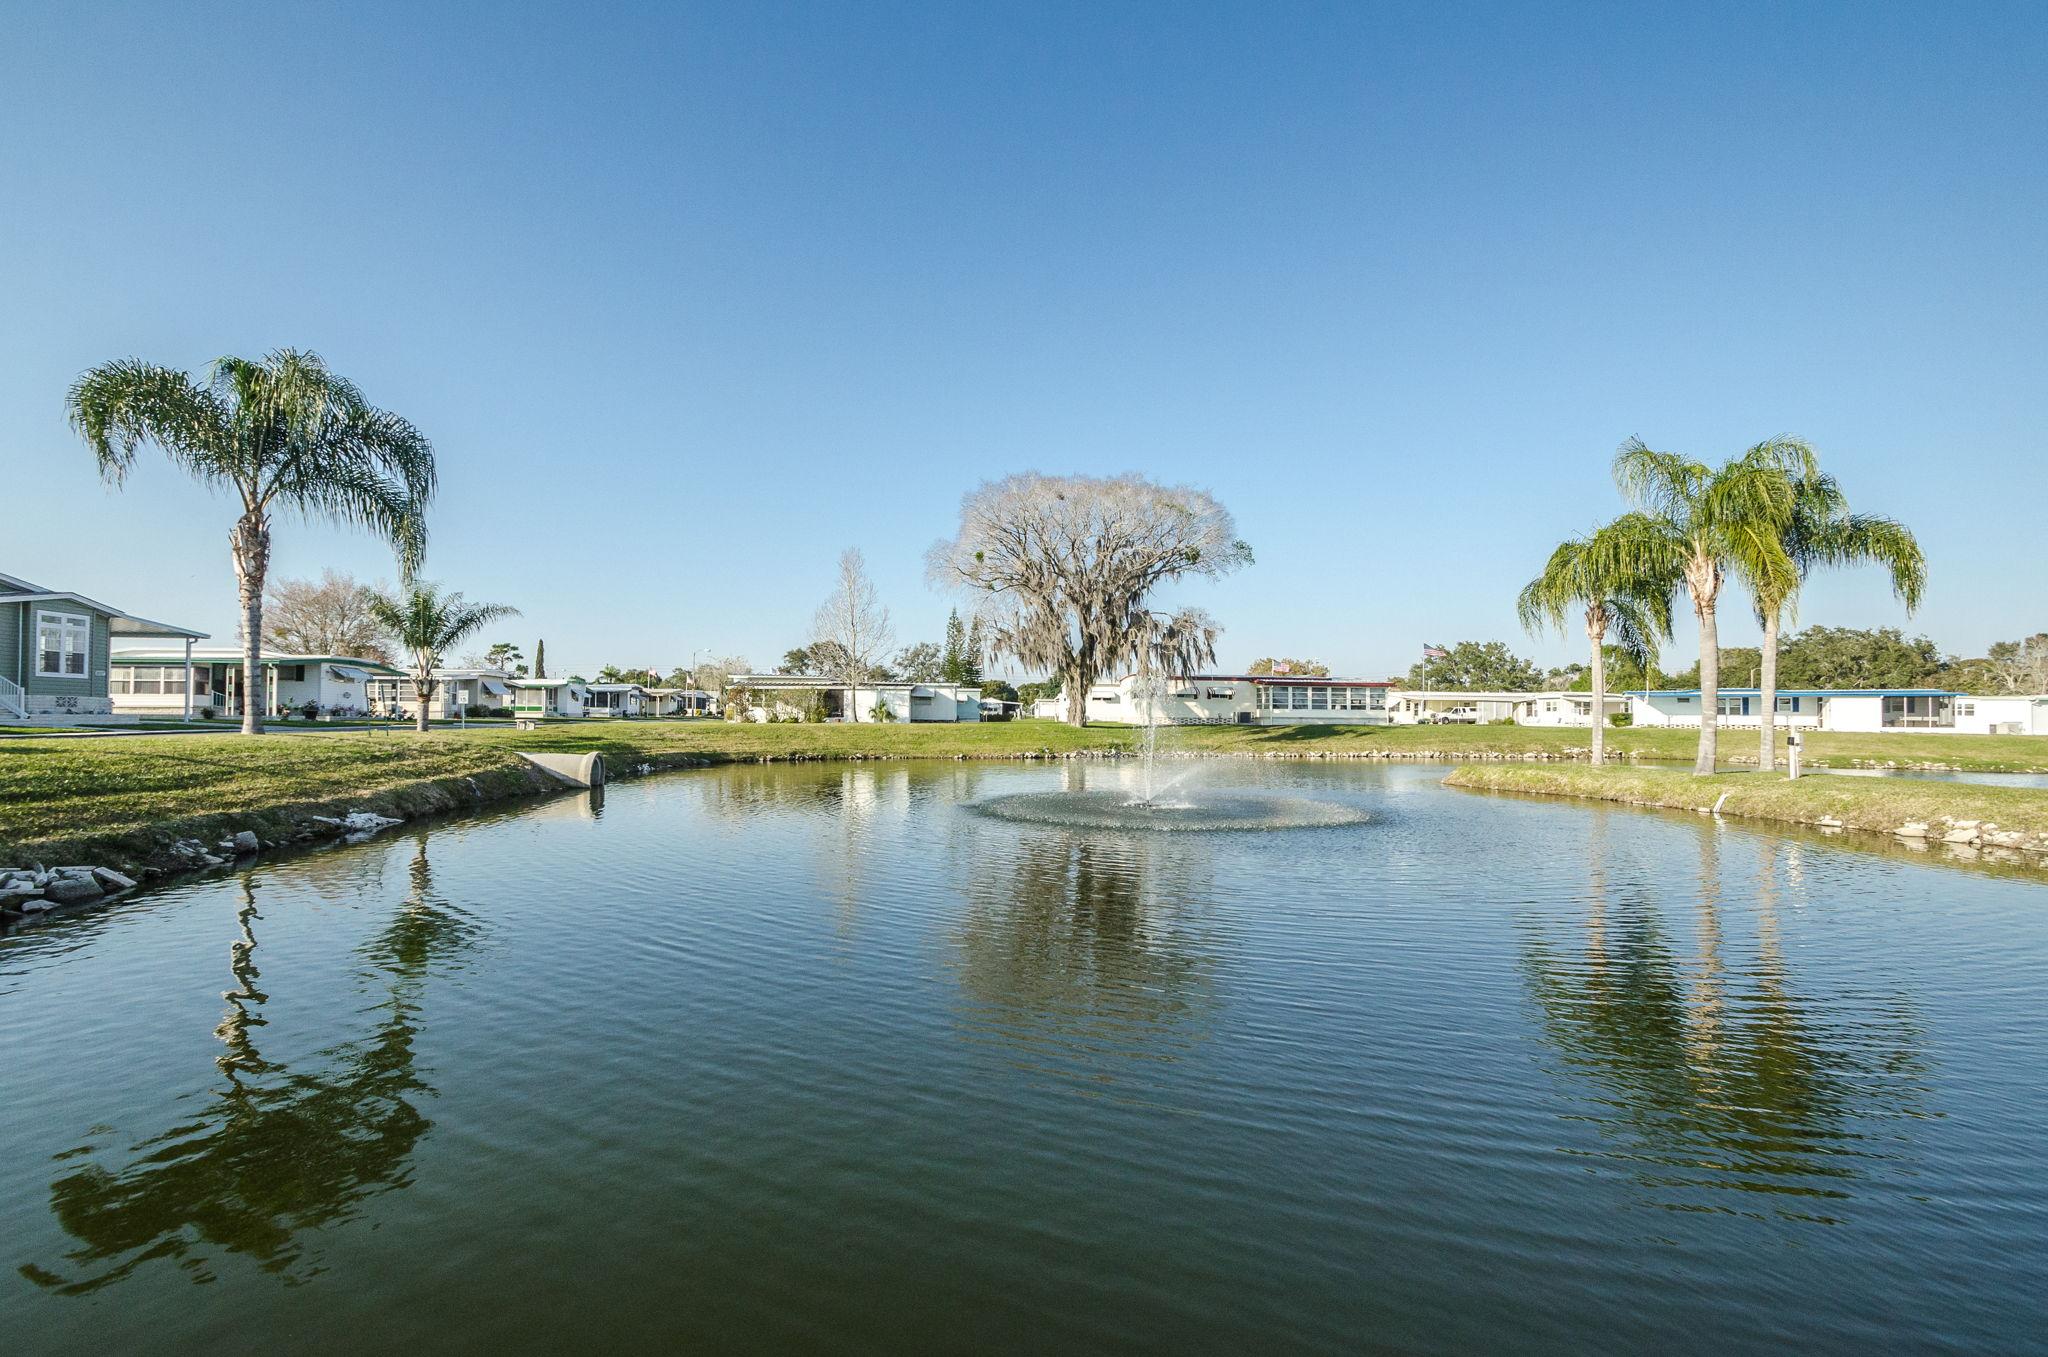 Tanglewood Pond View